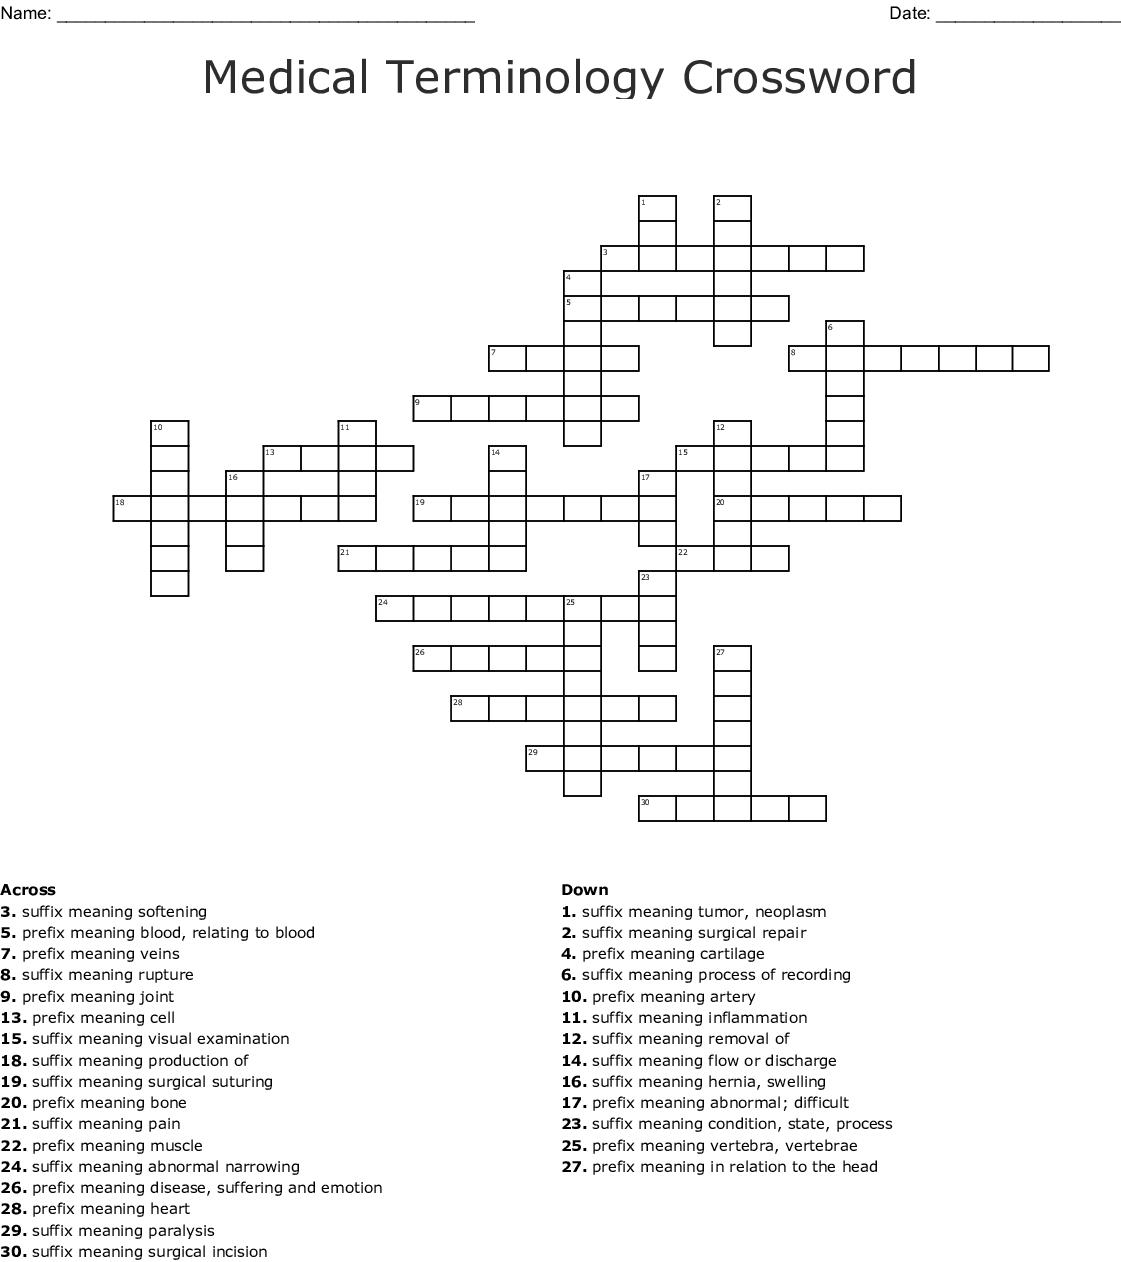 Medical Terminology Chapter 1 Crossword